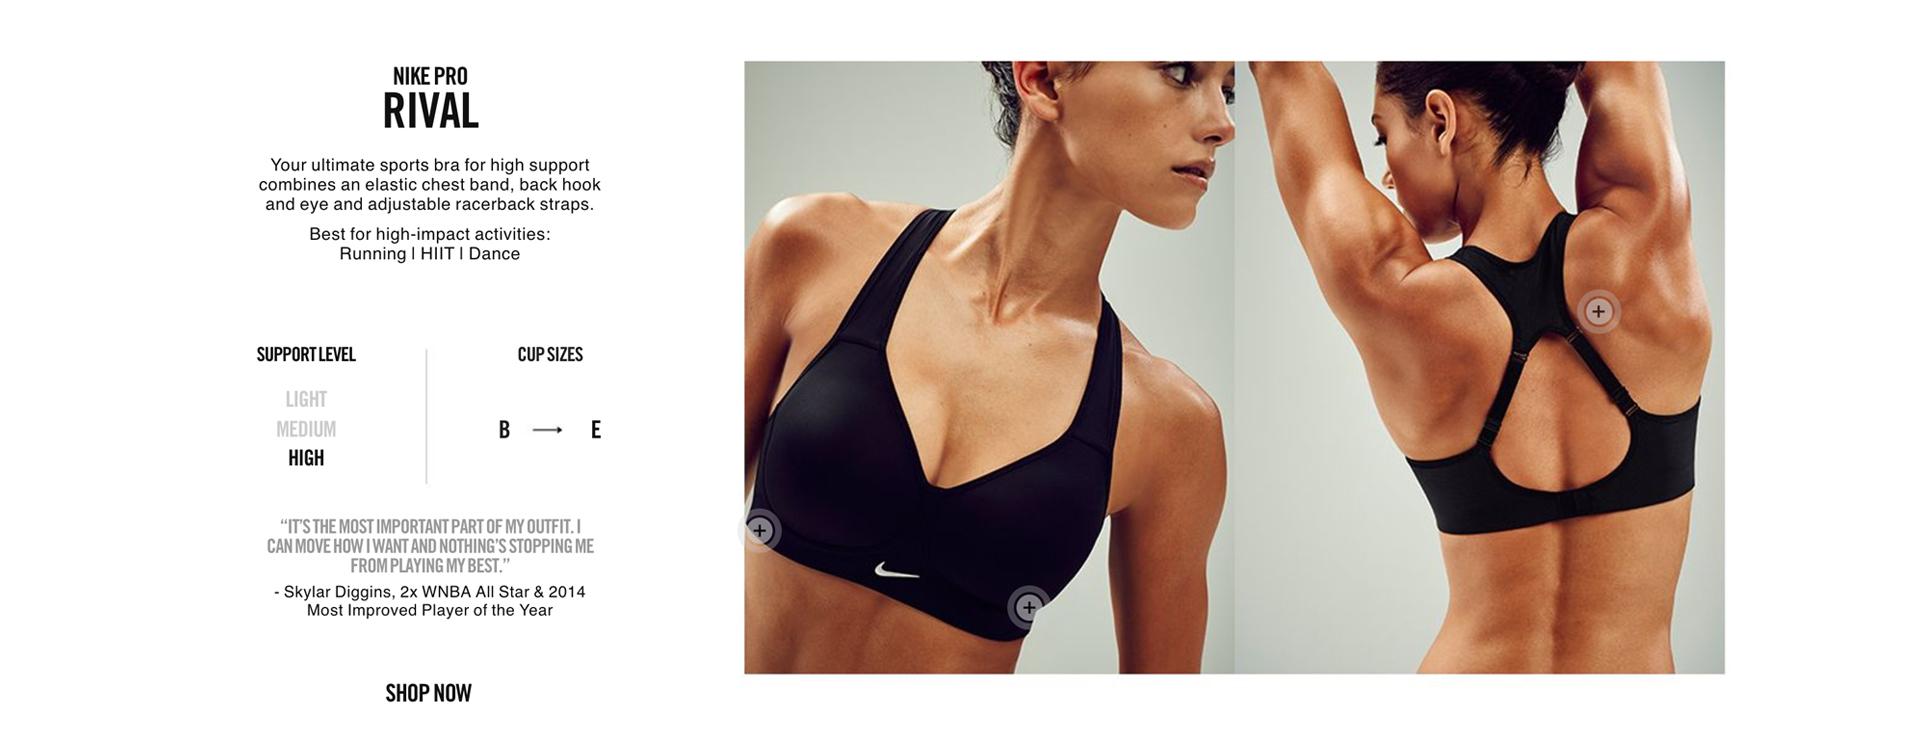 best service 2b7fa 0b1cb Check it out  Nike Sports Bra Shop